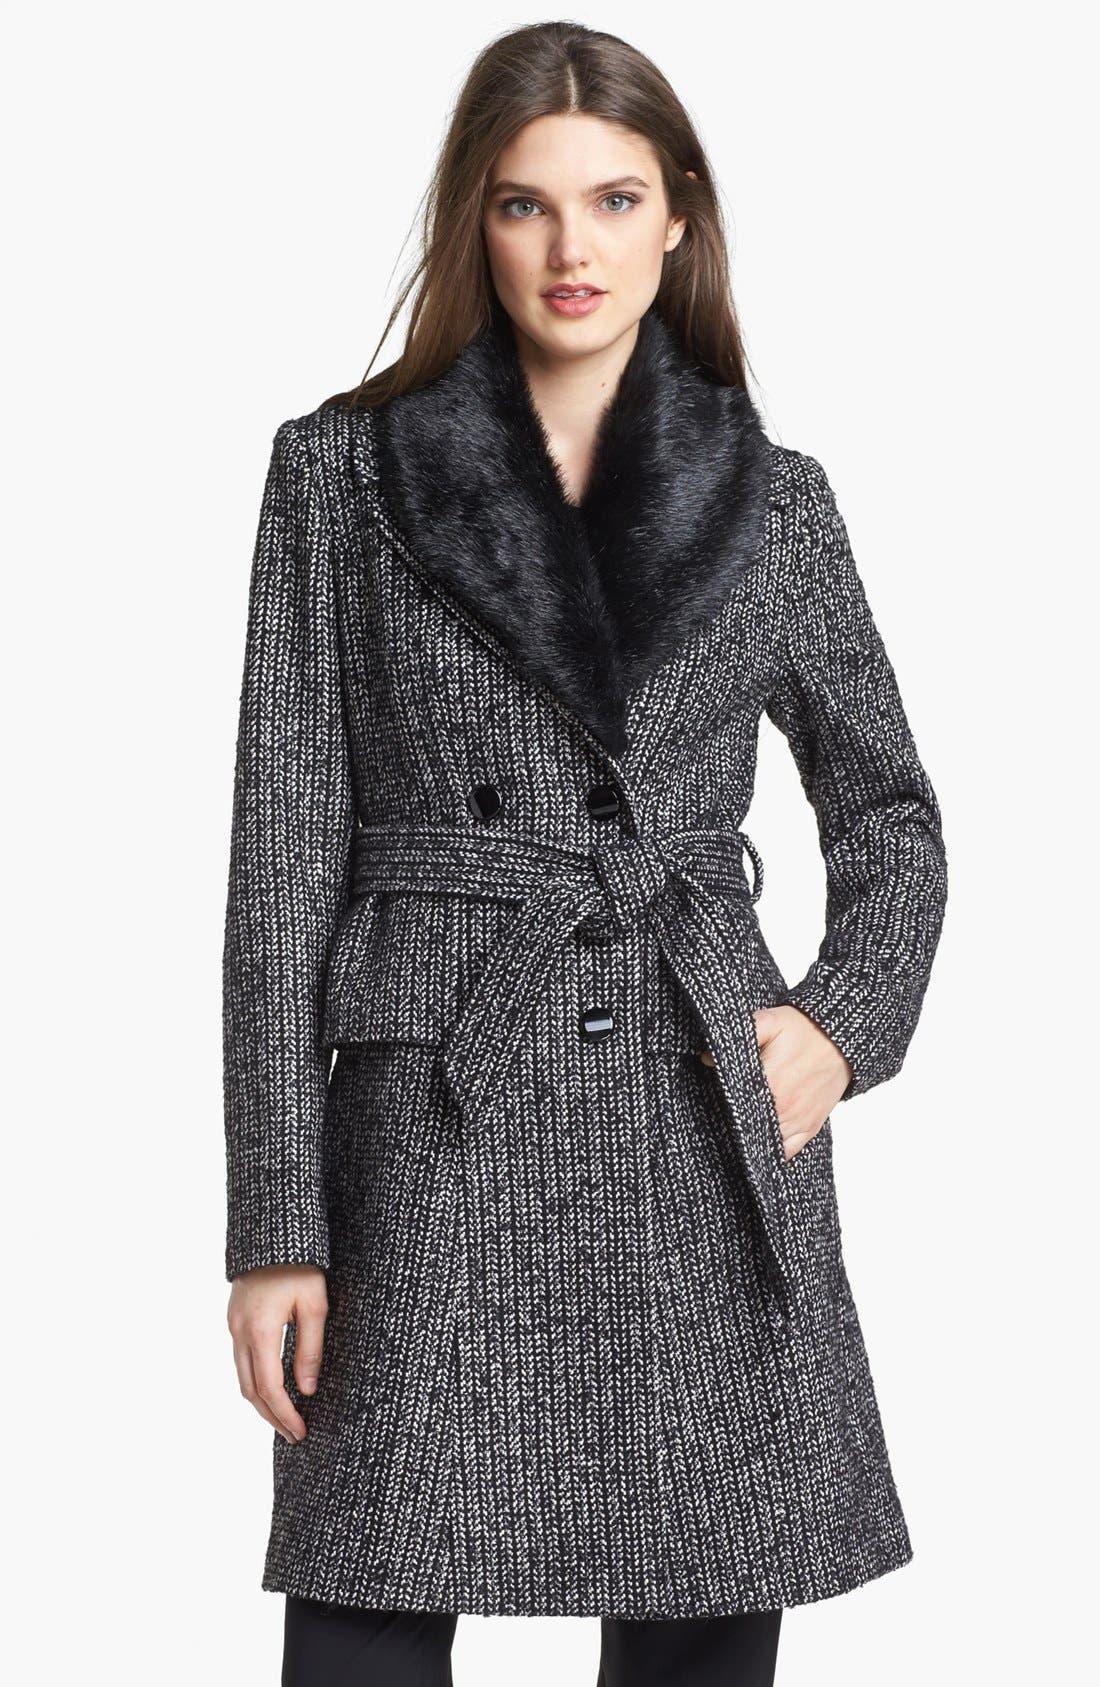 Main Image - Ivanka Trump Belted Tweed Coat with Detachable Faux Fur Collar